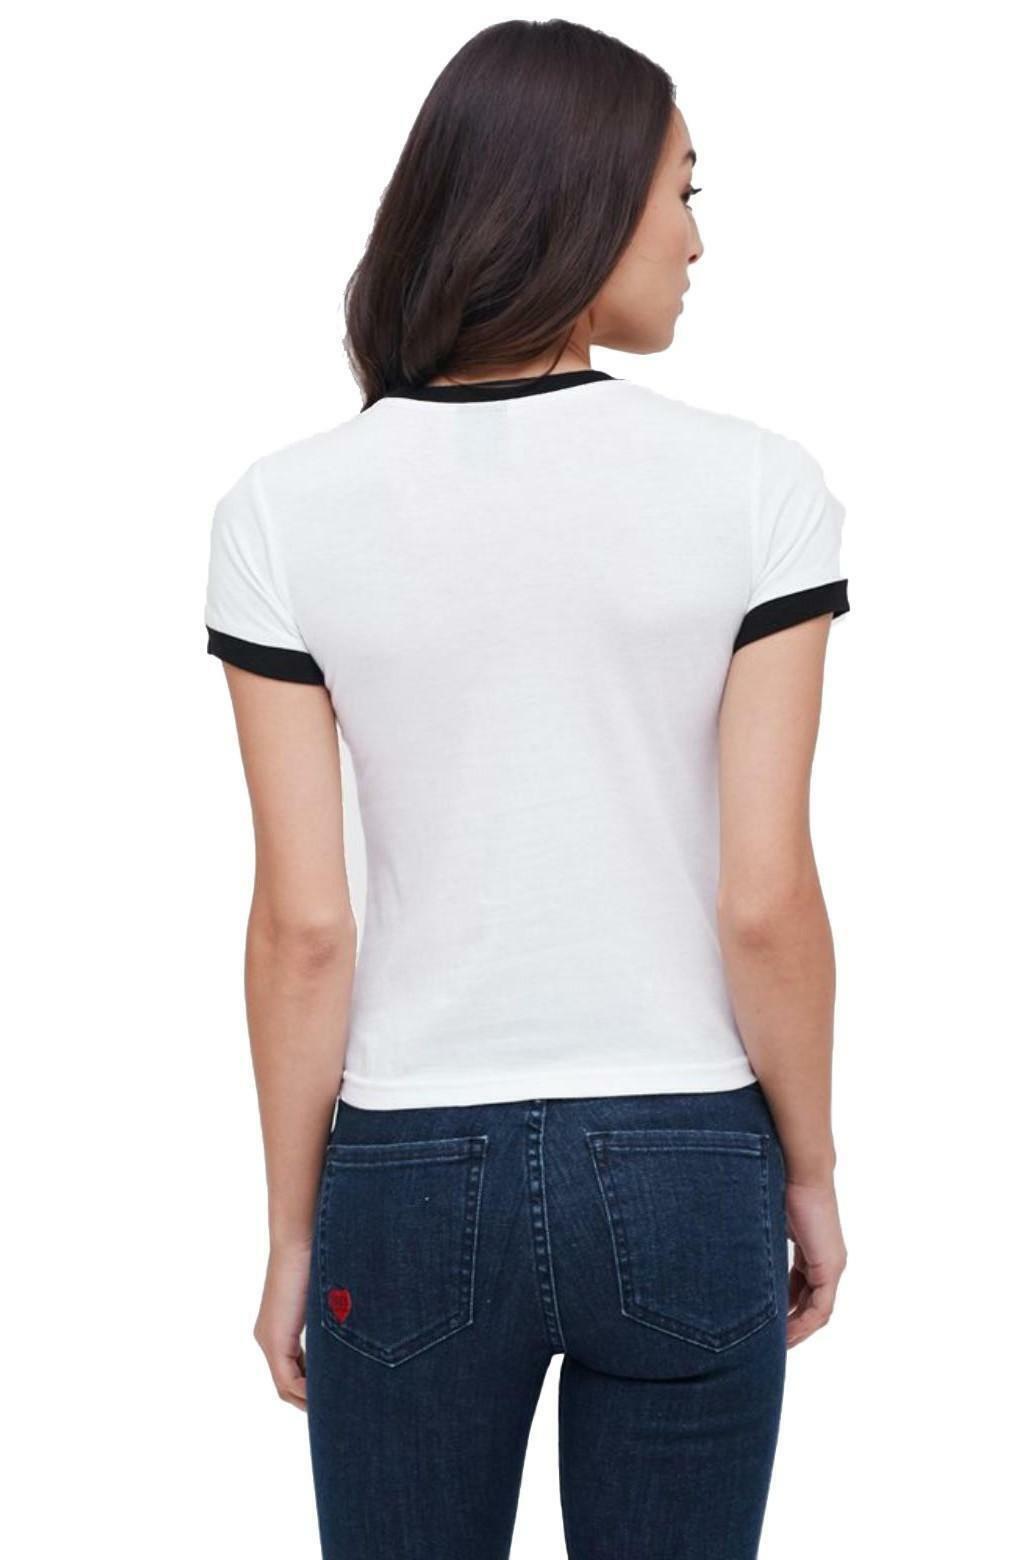 obey obey typewriter t-shirt donna bianca 22118w189